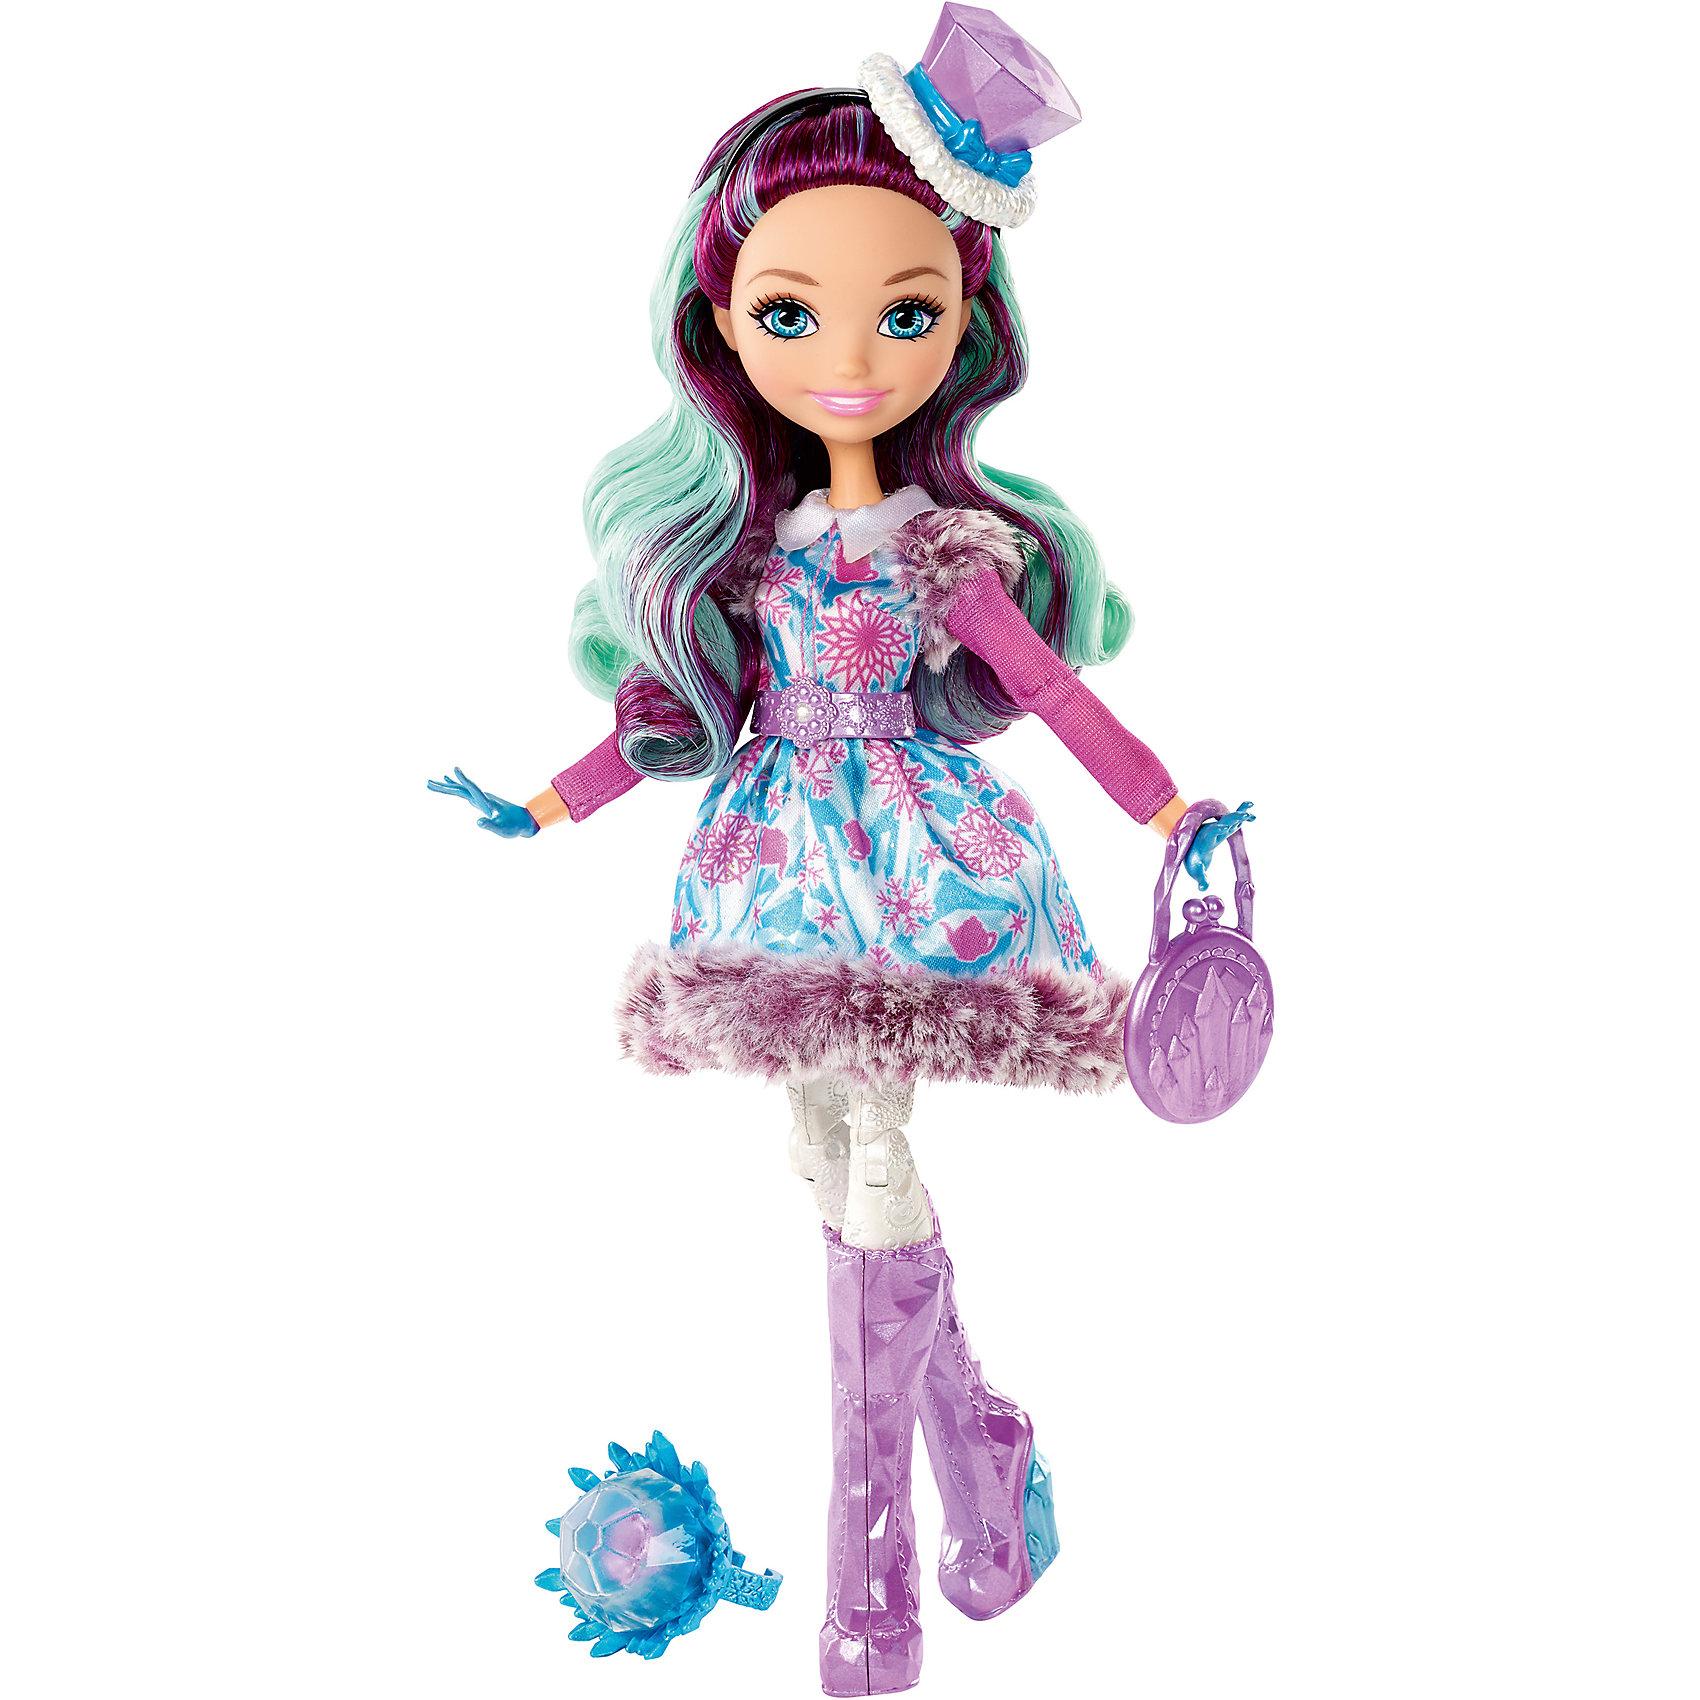 Mattel Кукла из коллекции Заколдованная зима, Ever After High кукла кана из серии джуку